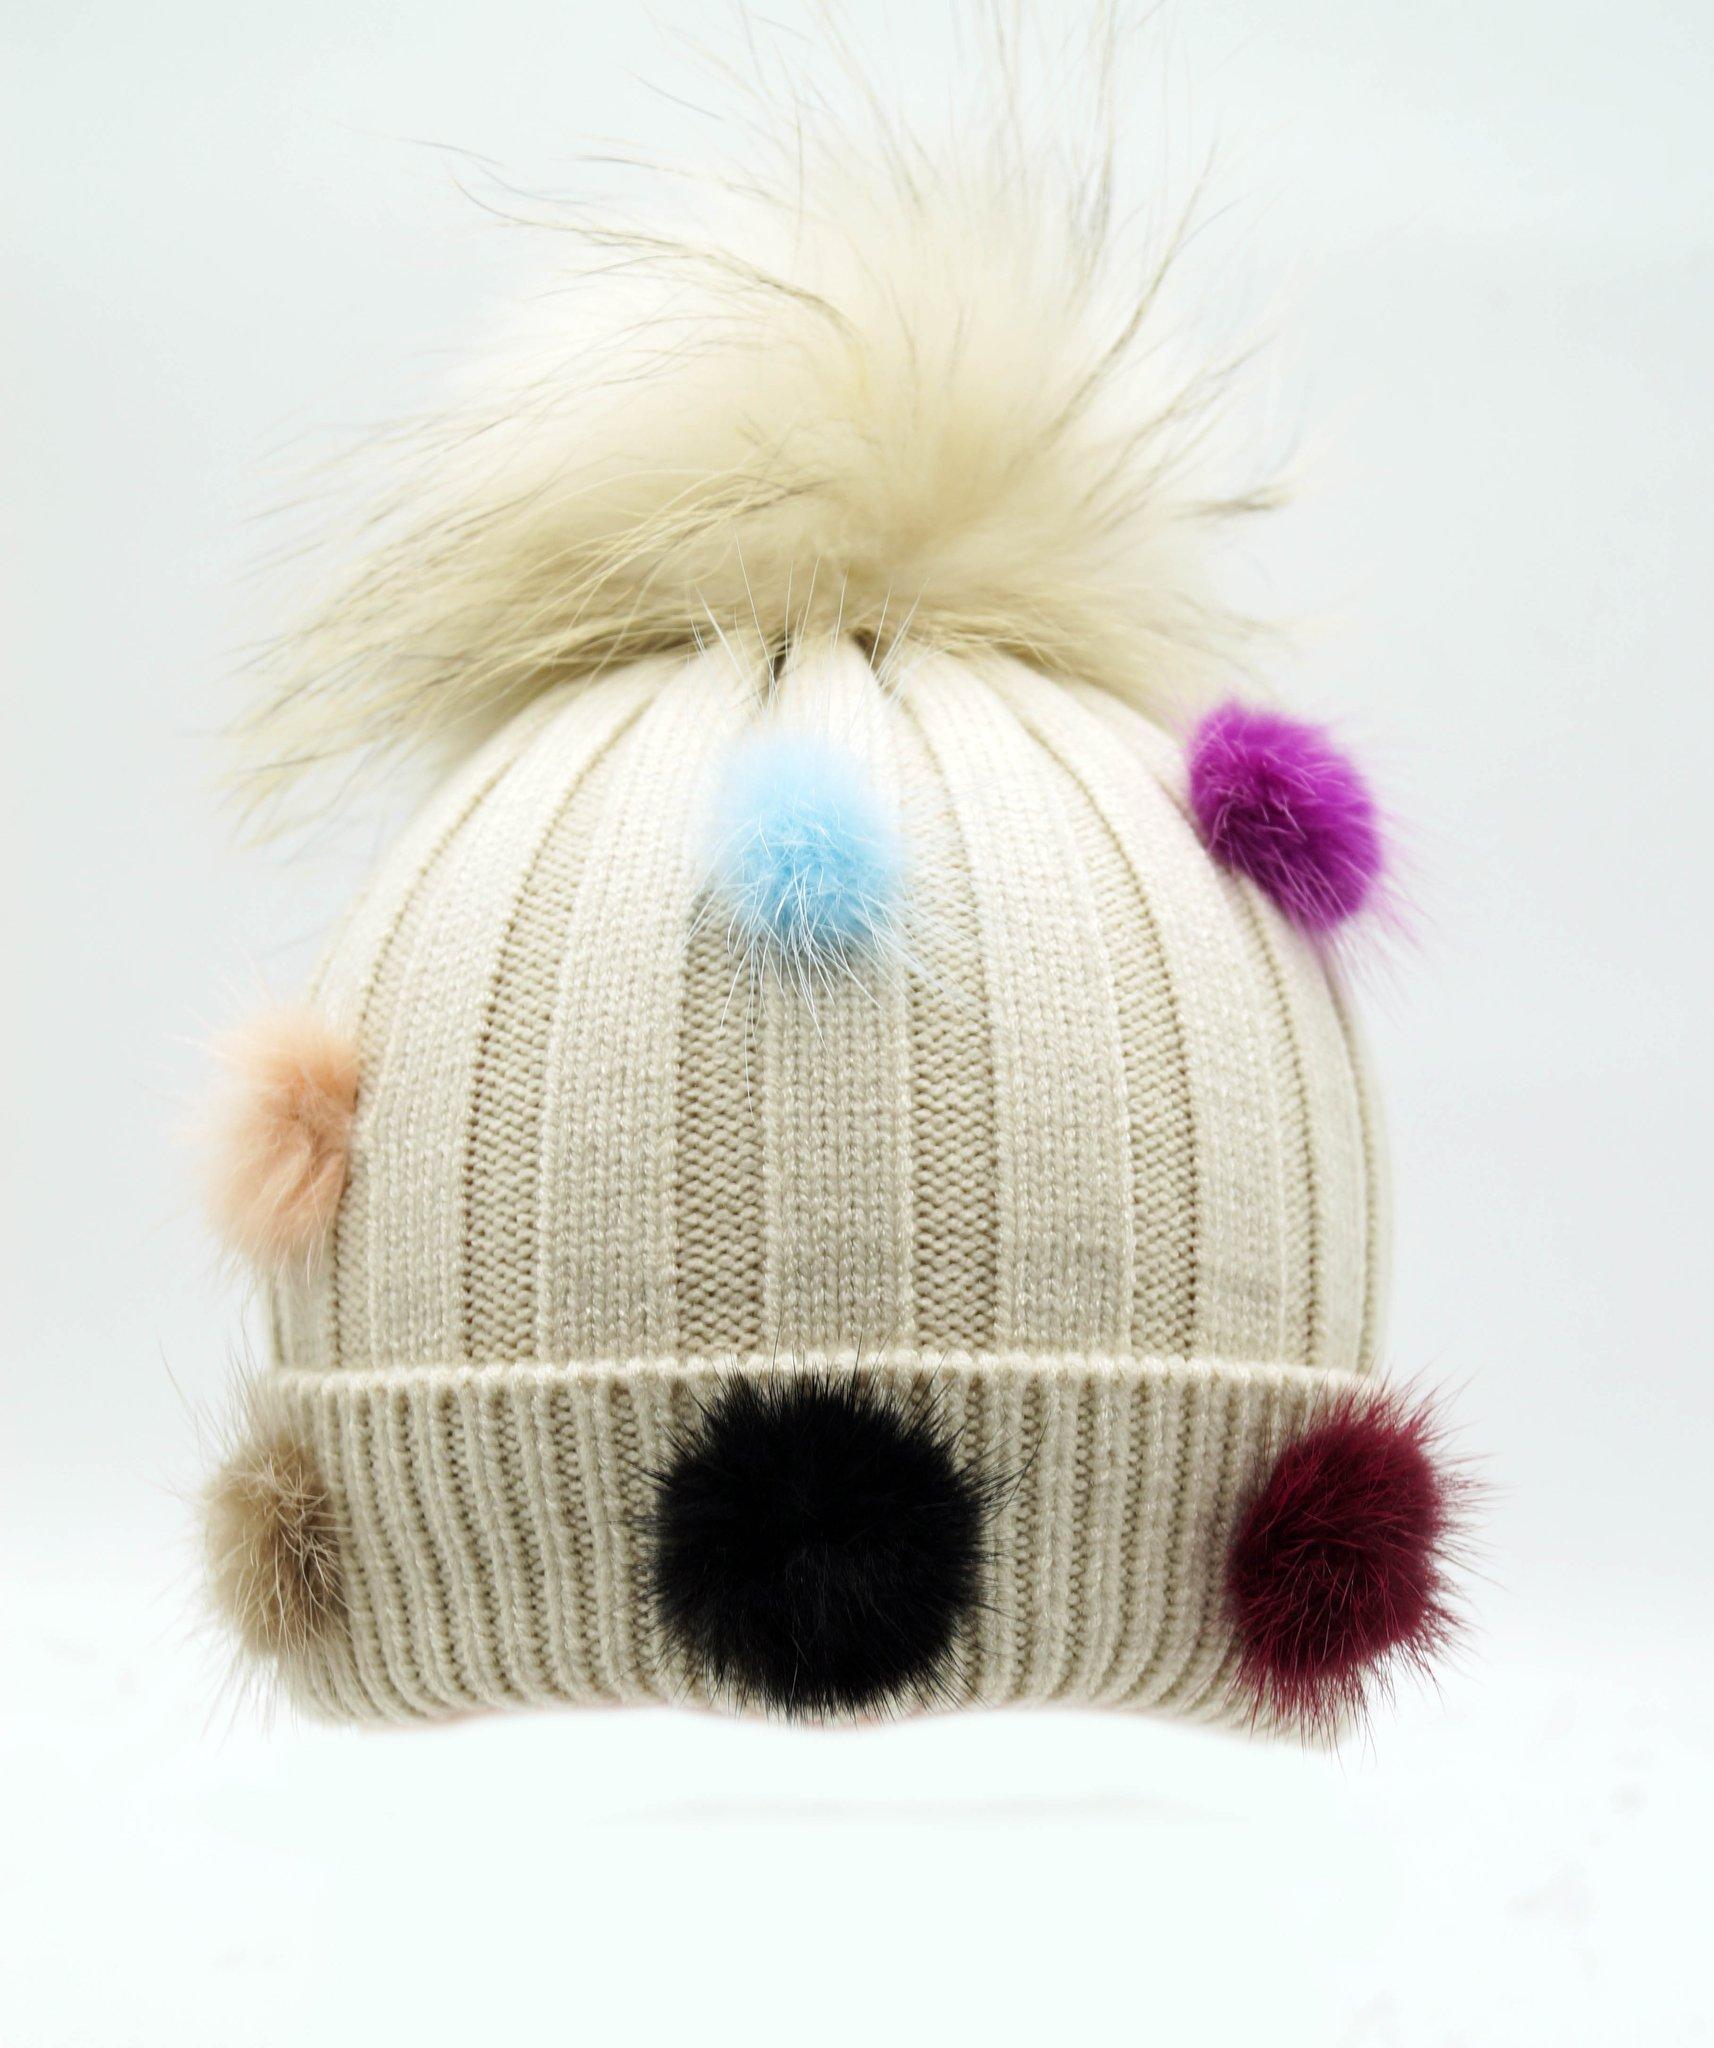 f390d4165da5a Details about Kids Knit Pom Pom Winter Hats Girl Boy Child Knit Bobble Cap  Ribbed Warm Outdoor